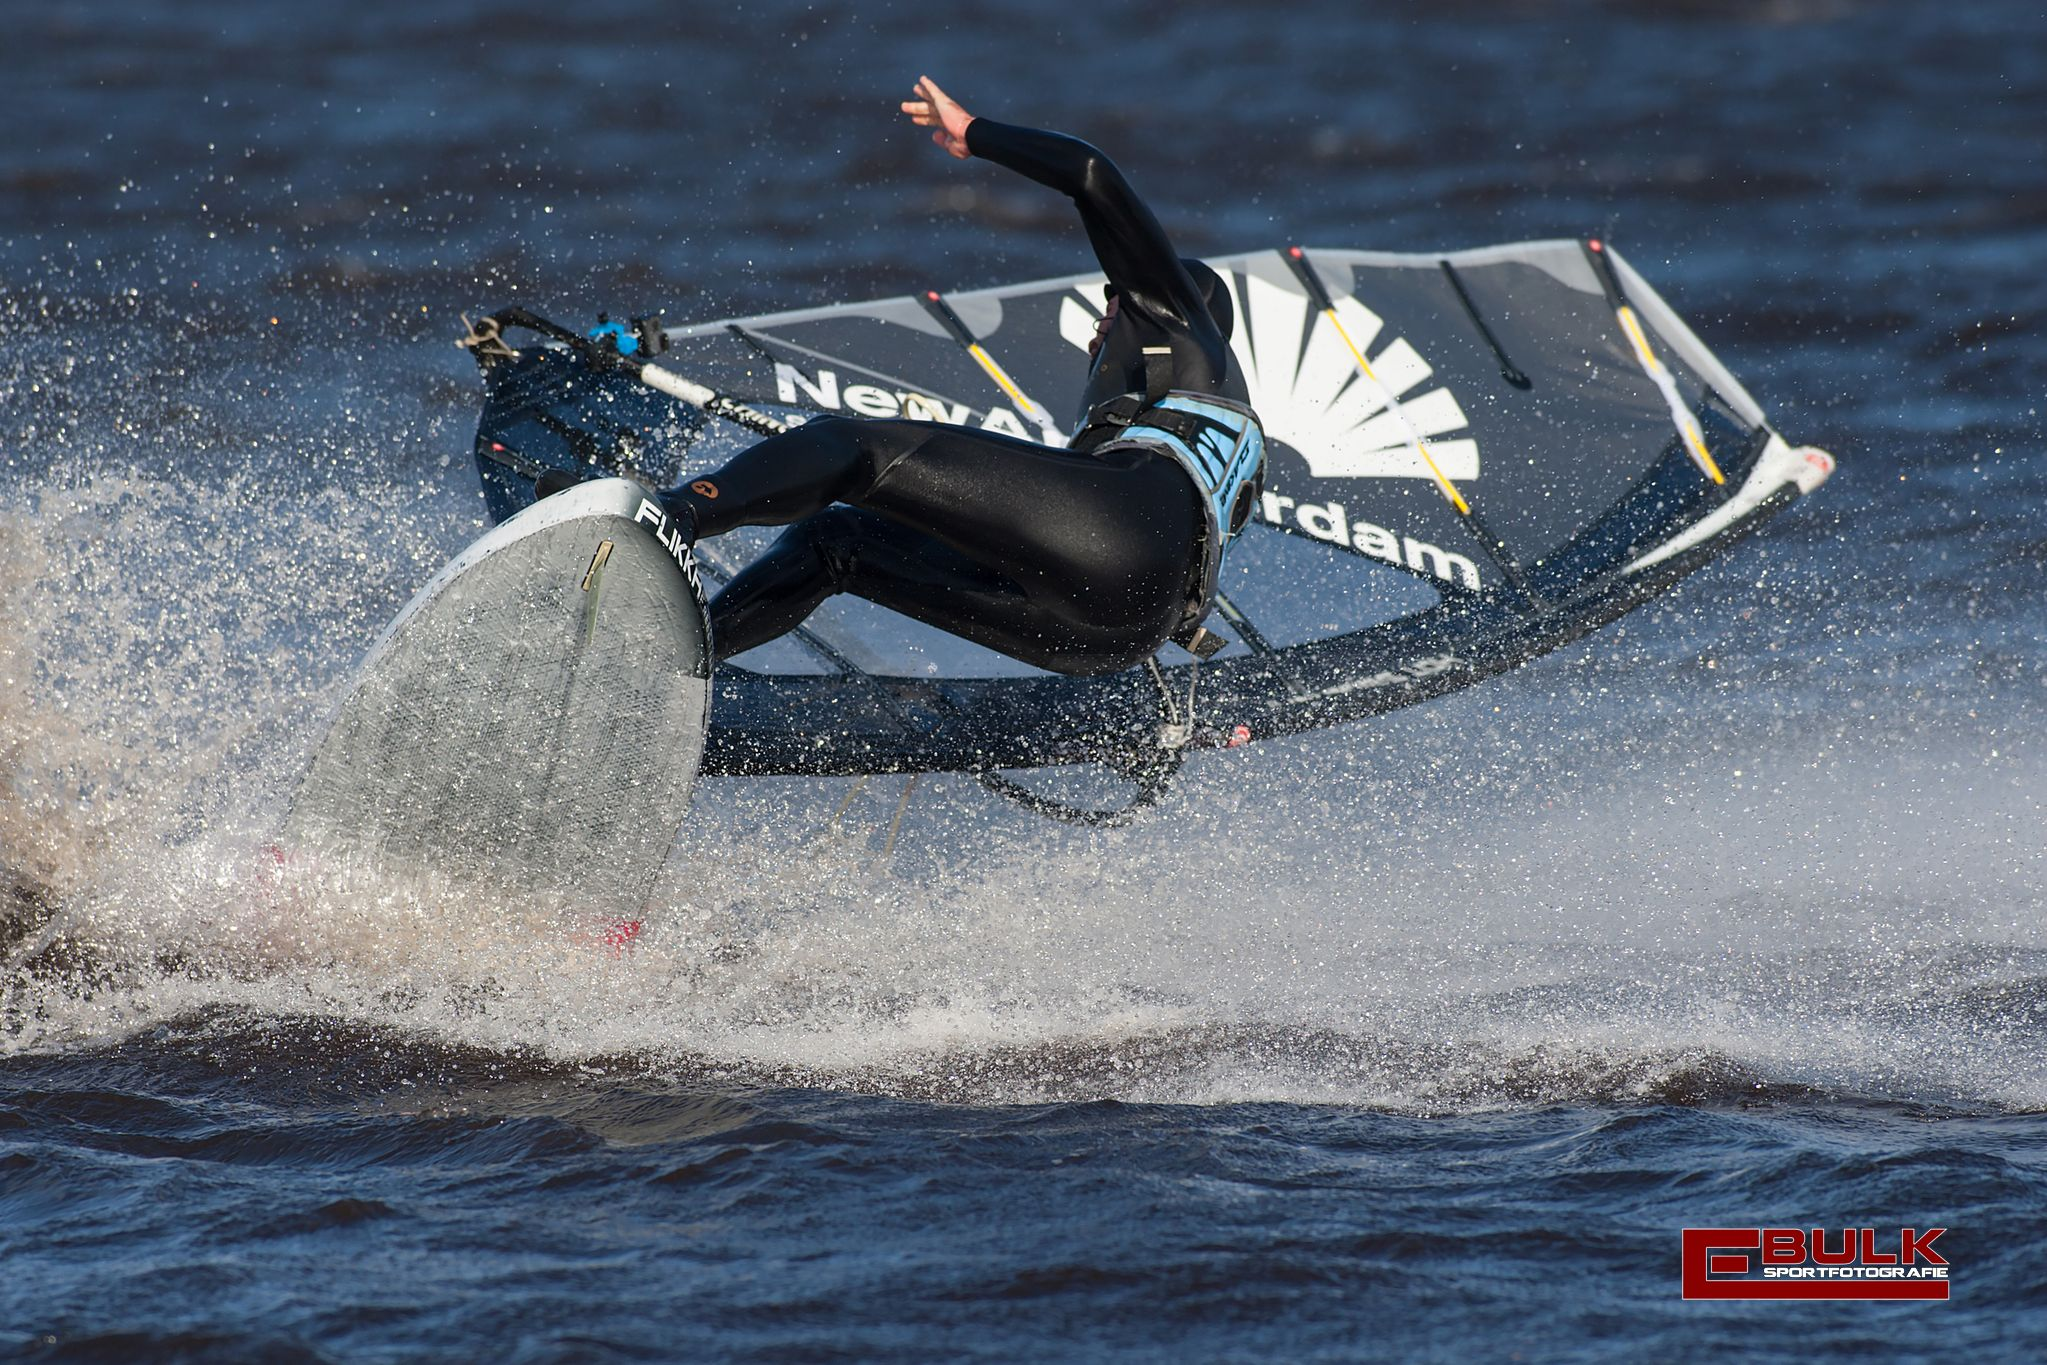 ebs_1270-ed_bulk_sportfotografie